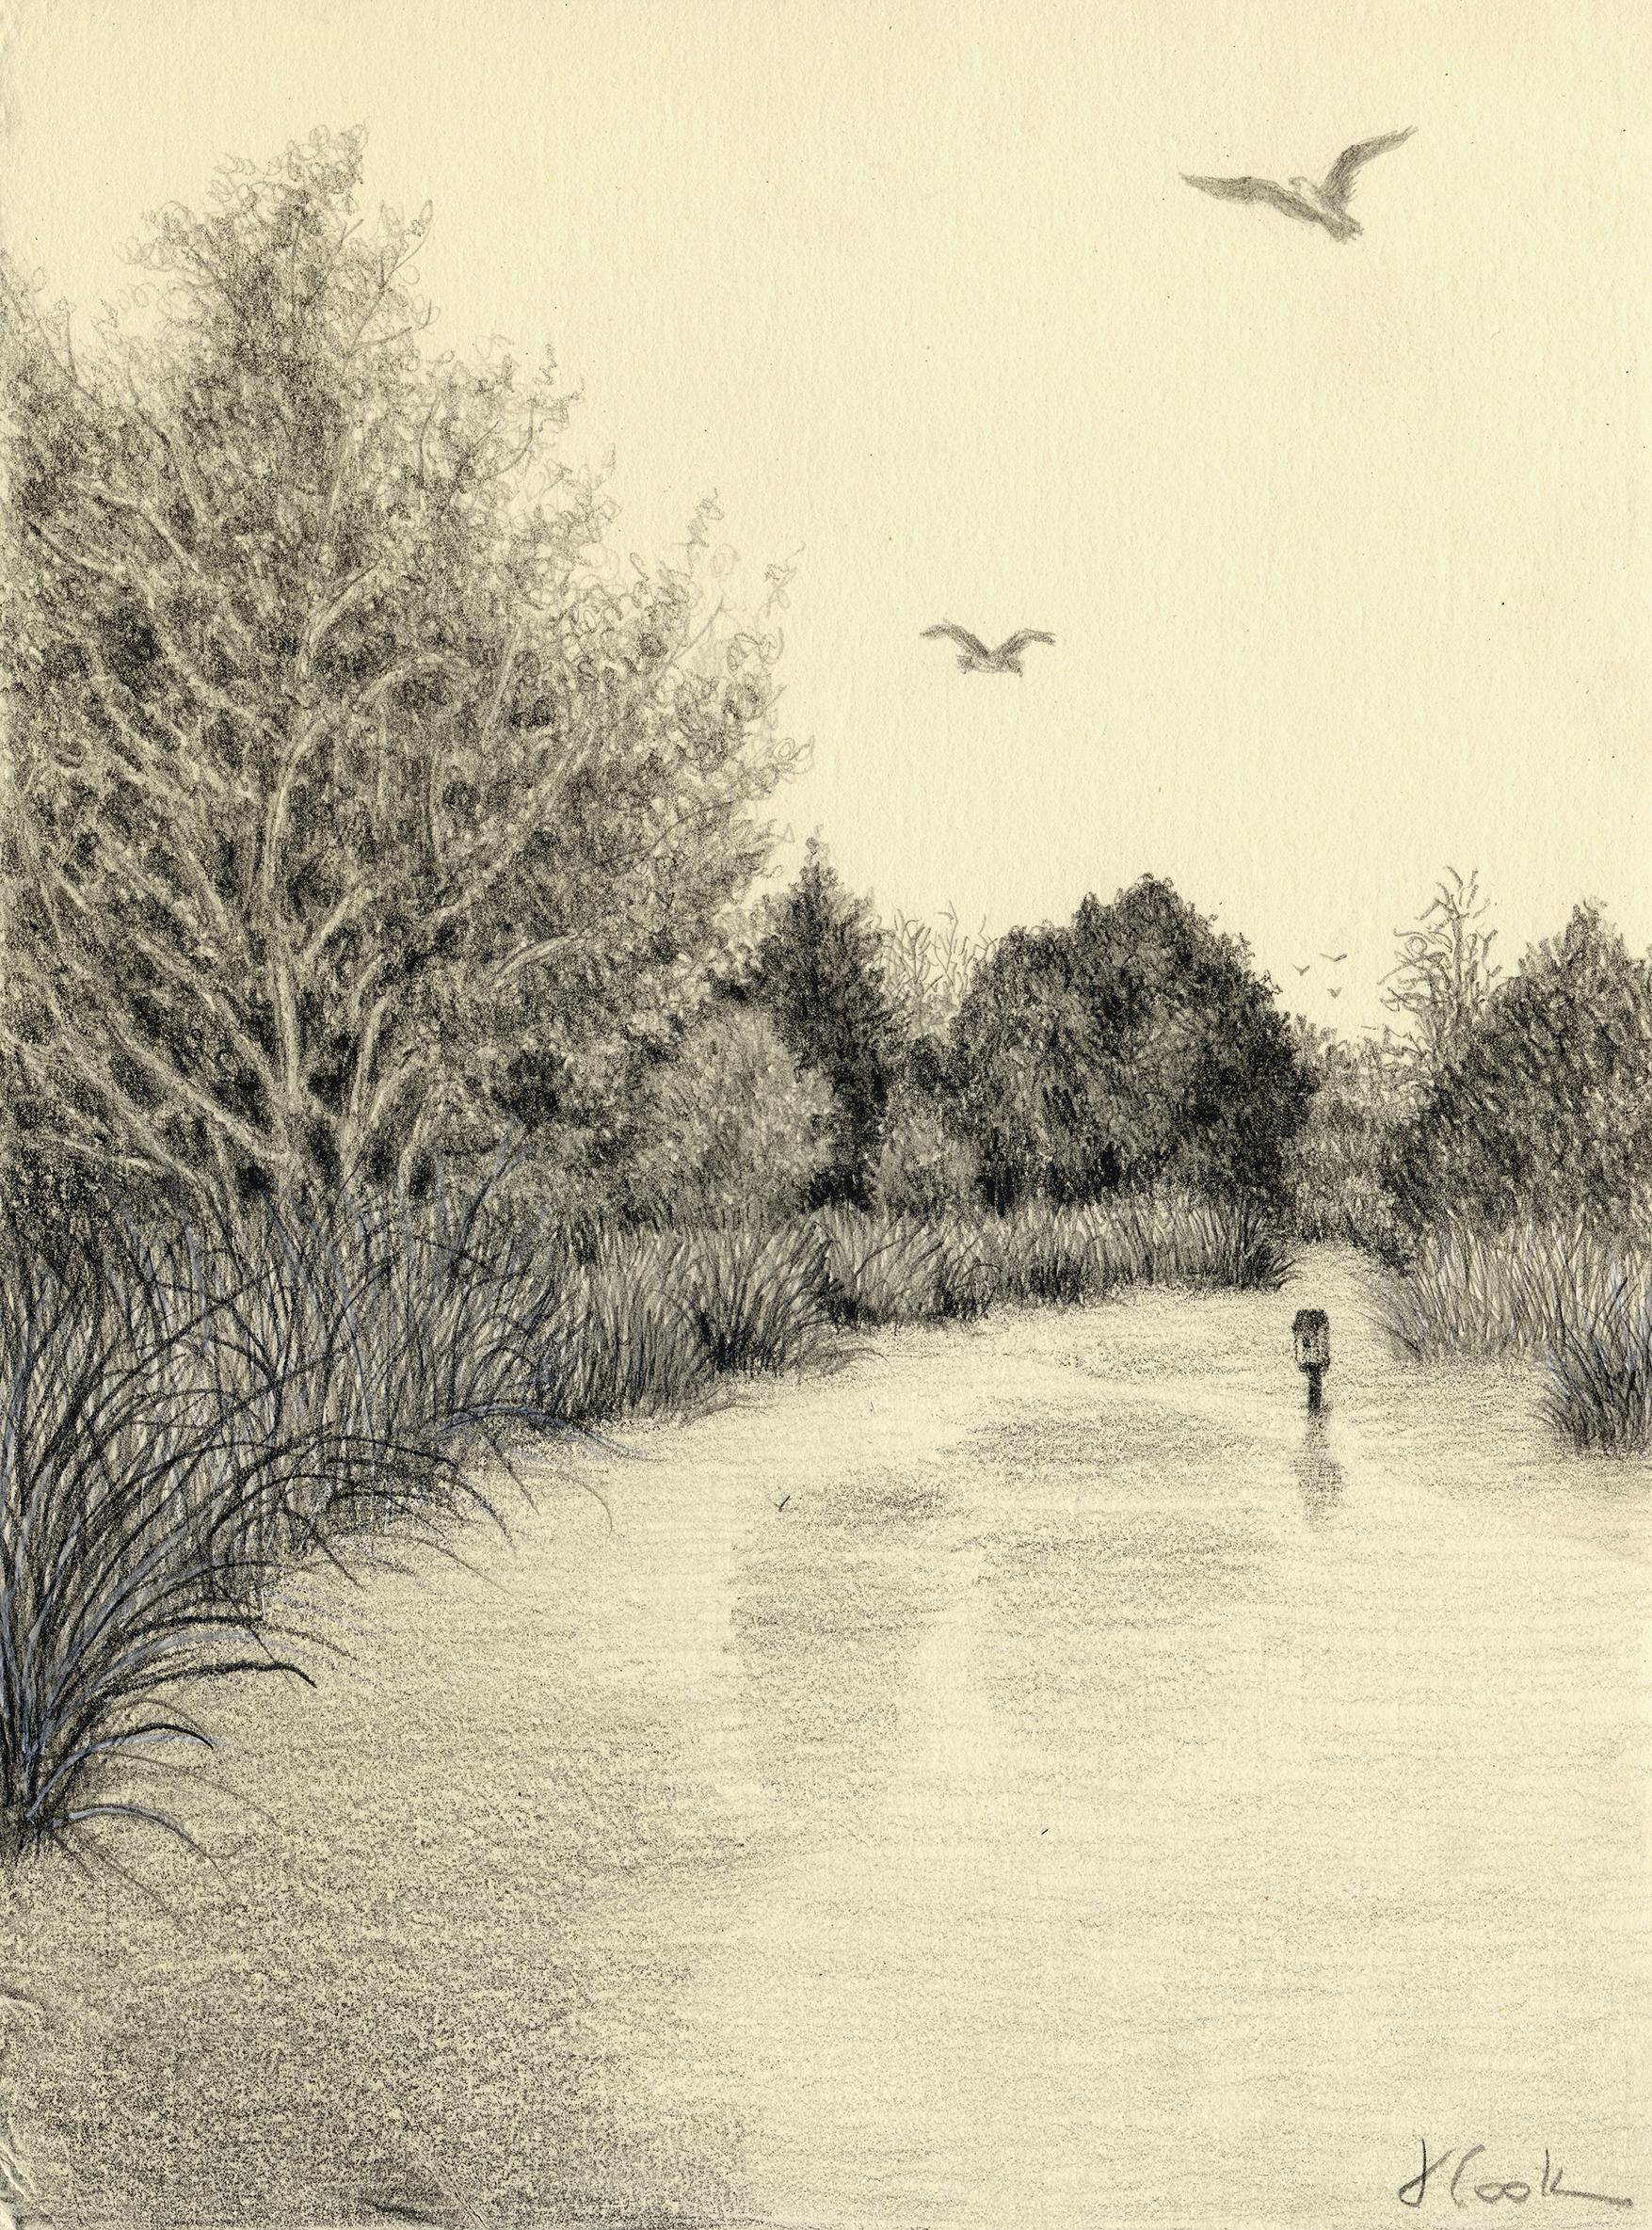 Osprey Patrol, Butler Island, graphite, Jeanine Cook artist